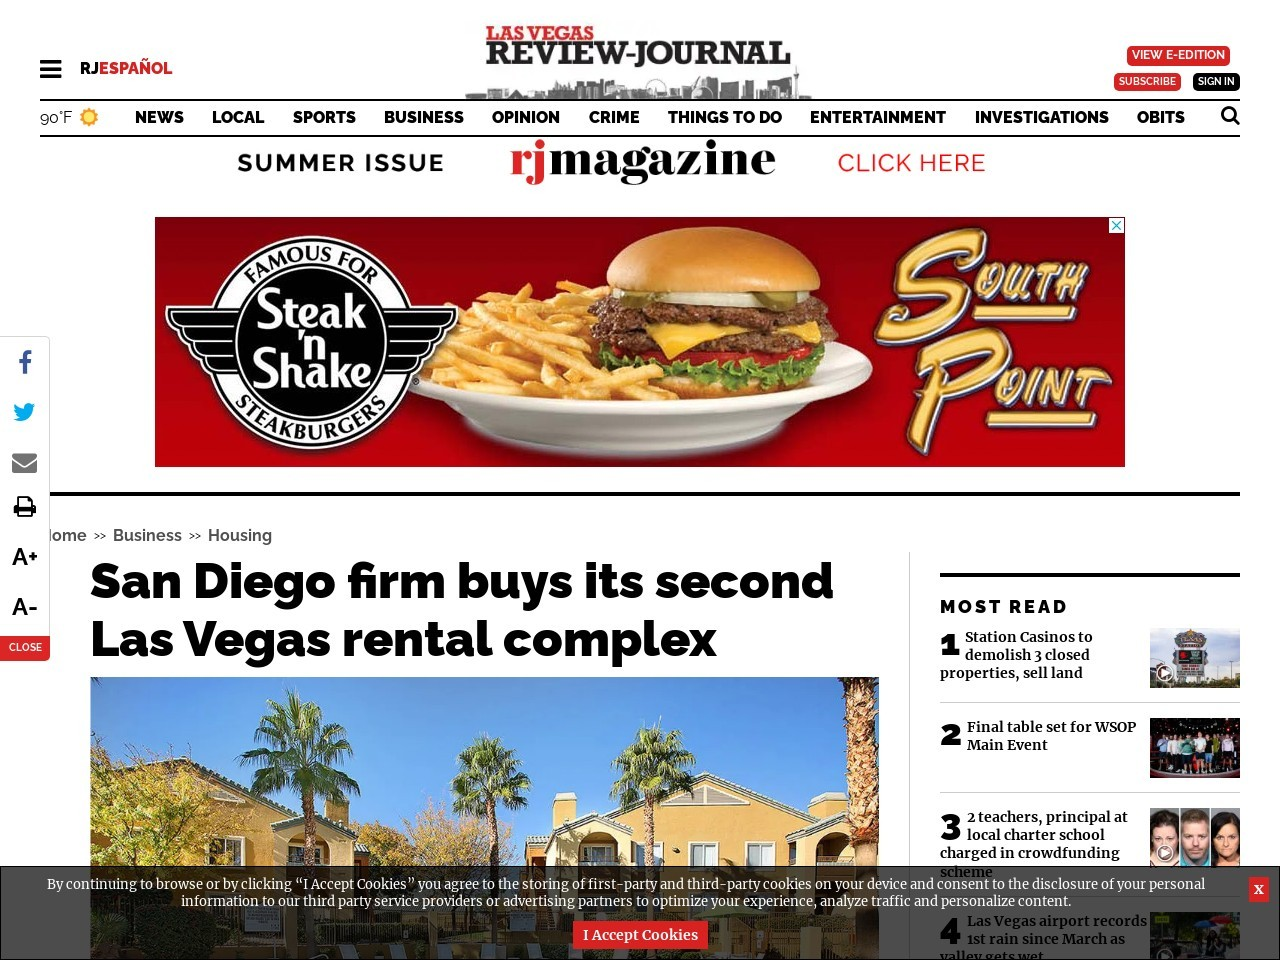 San Diego firm buys its second Las Vegas rental complex